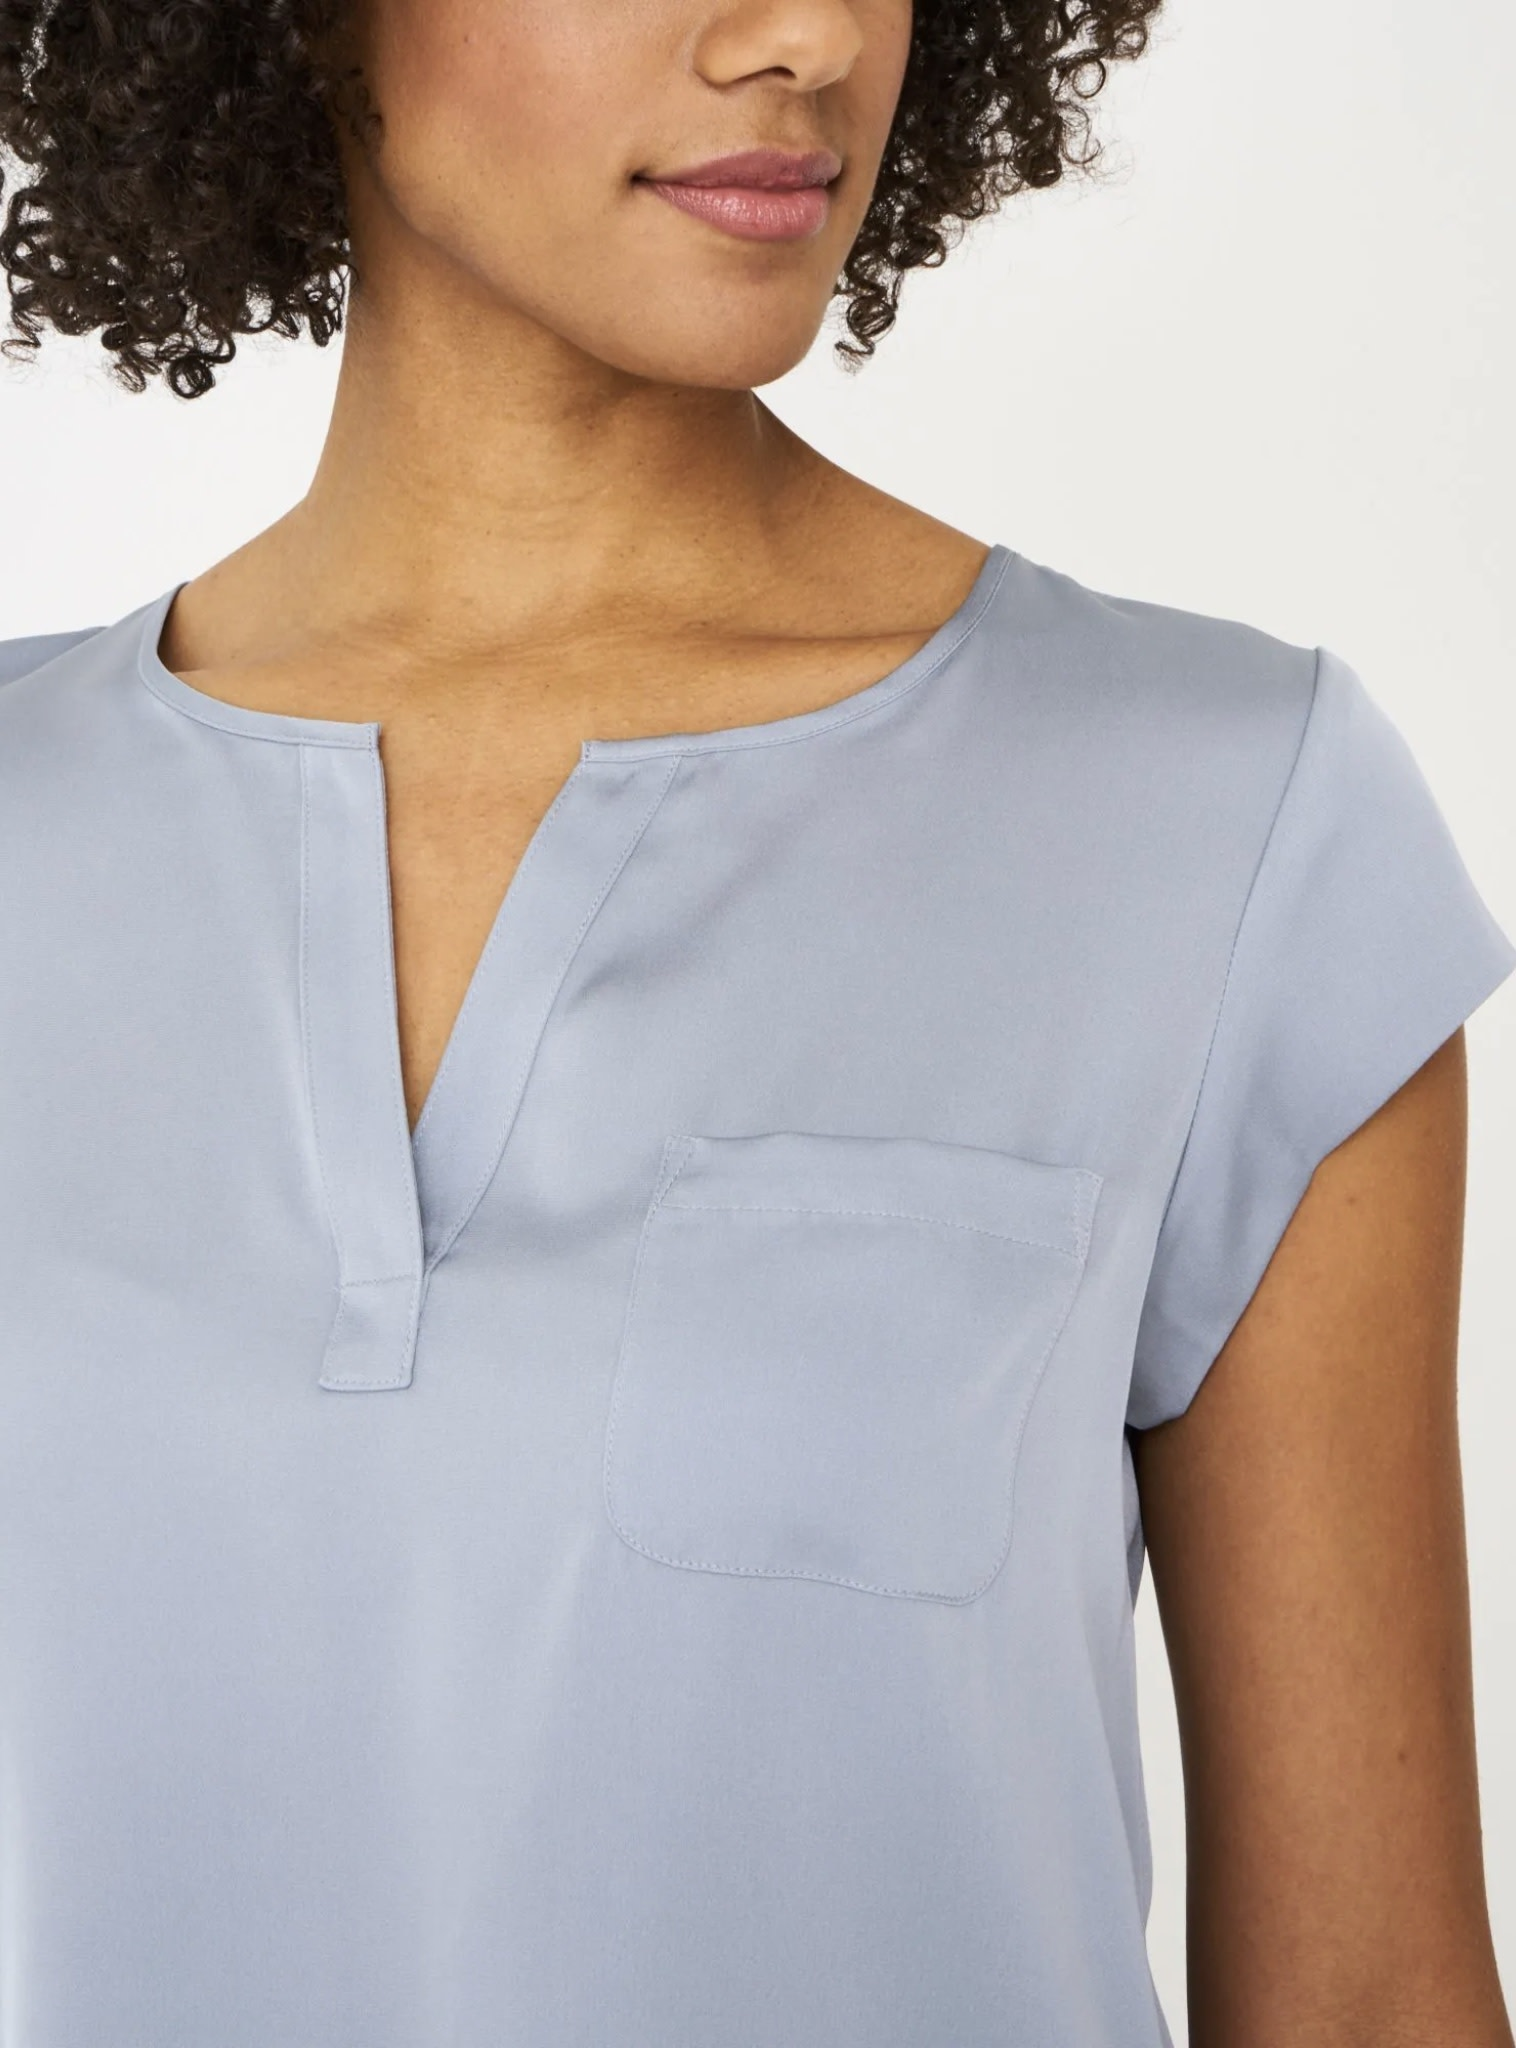 blouse repeat 600003-7